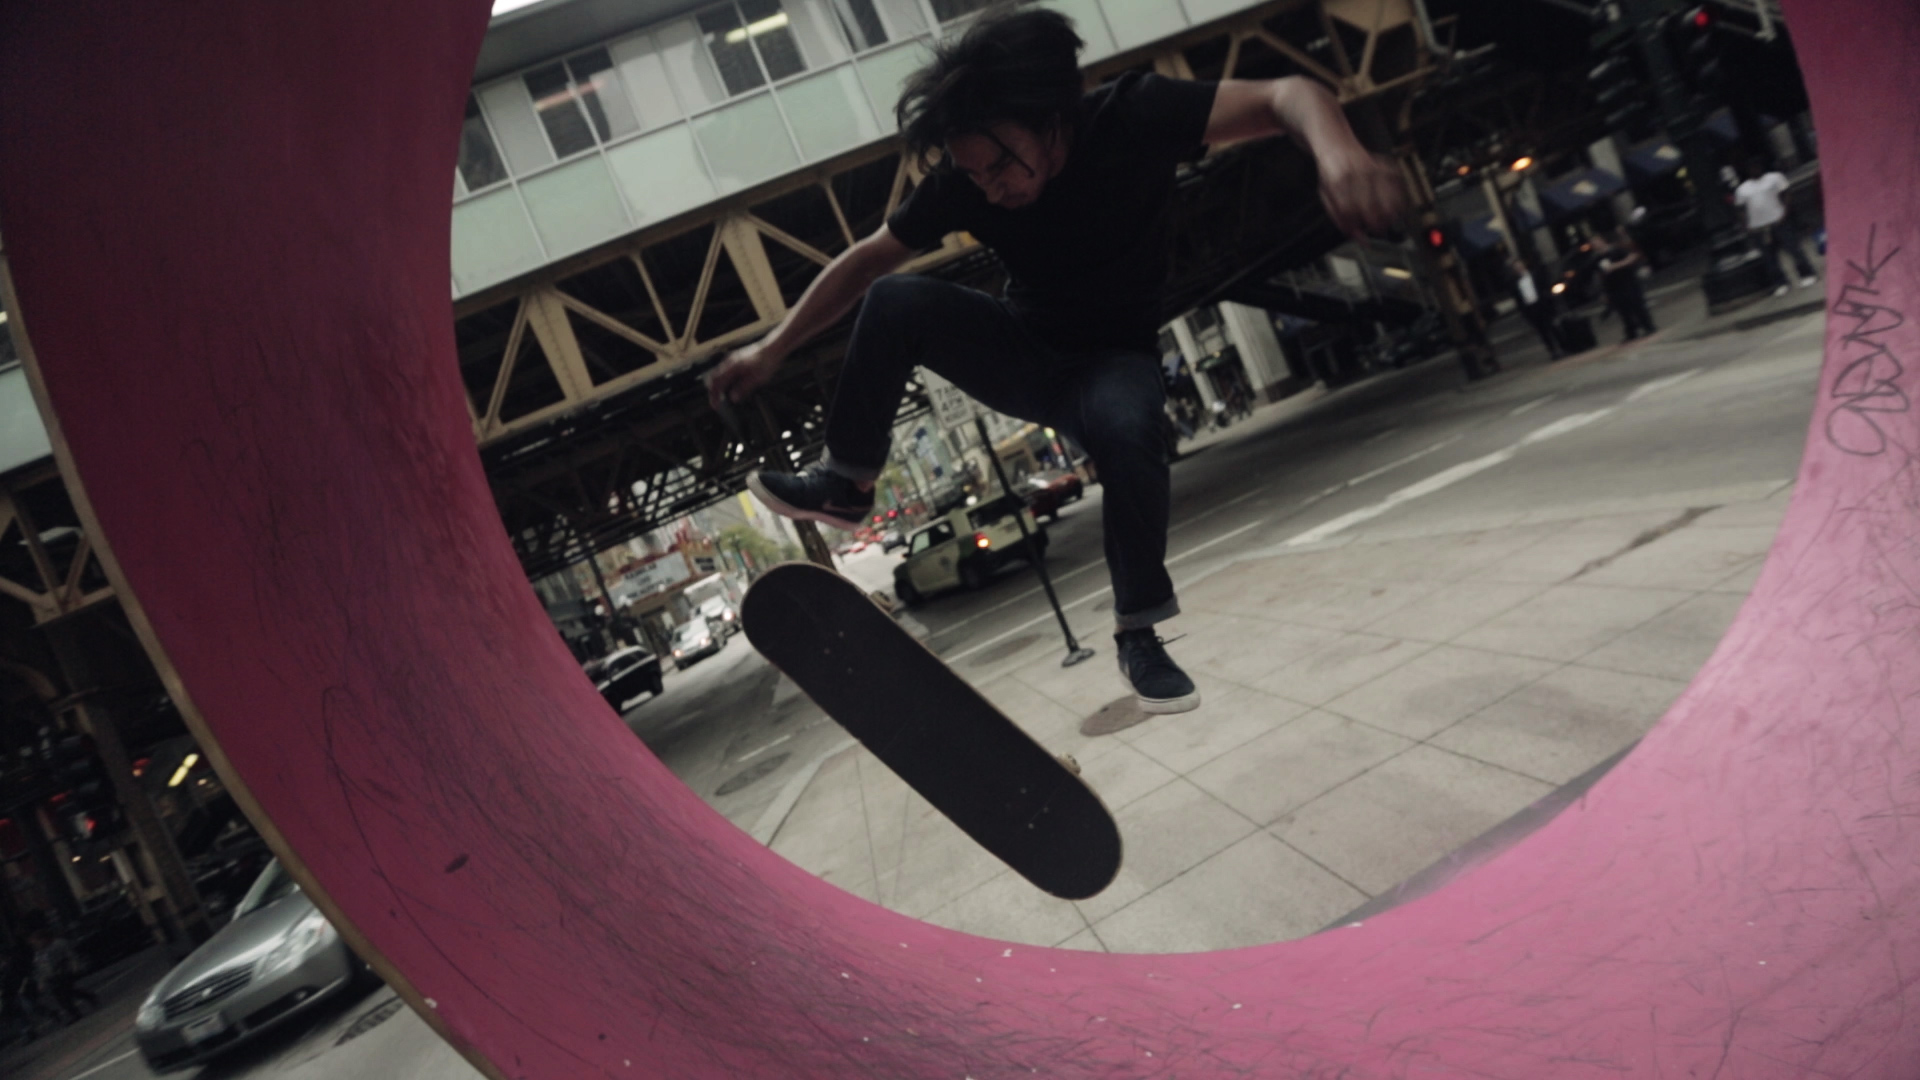 Kickflip.